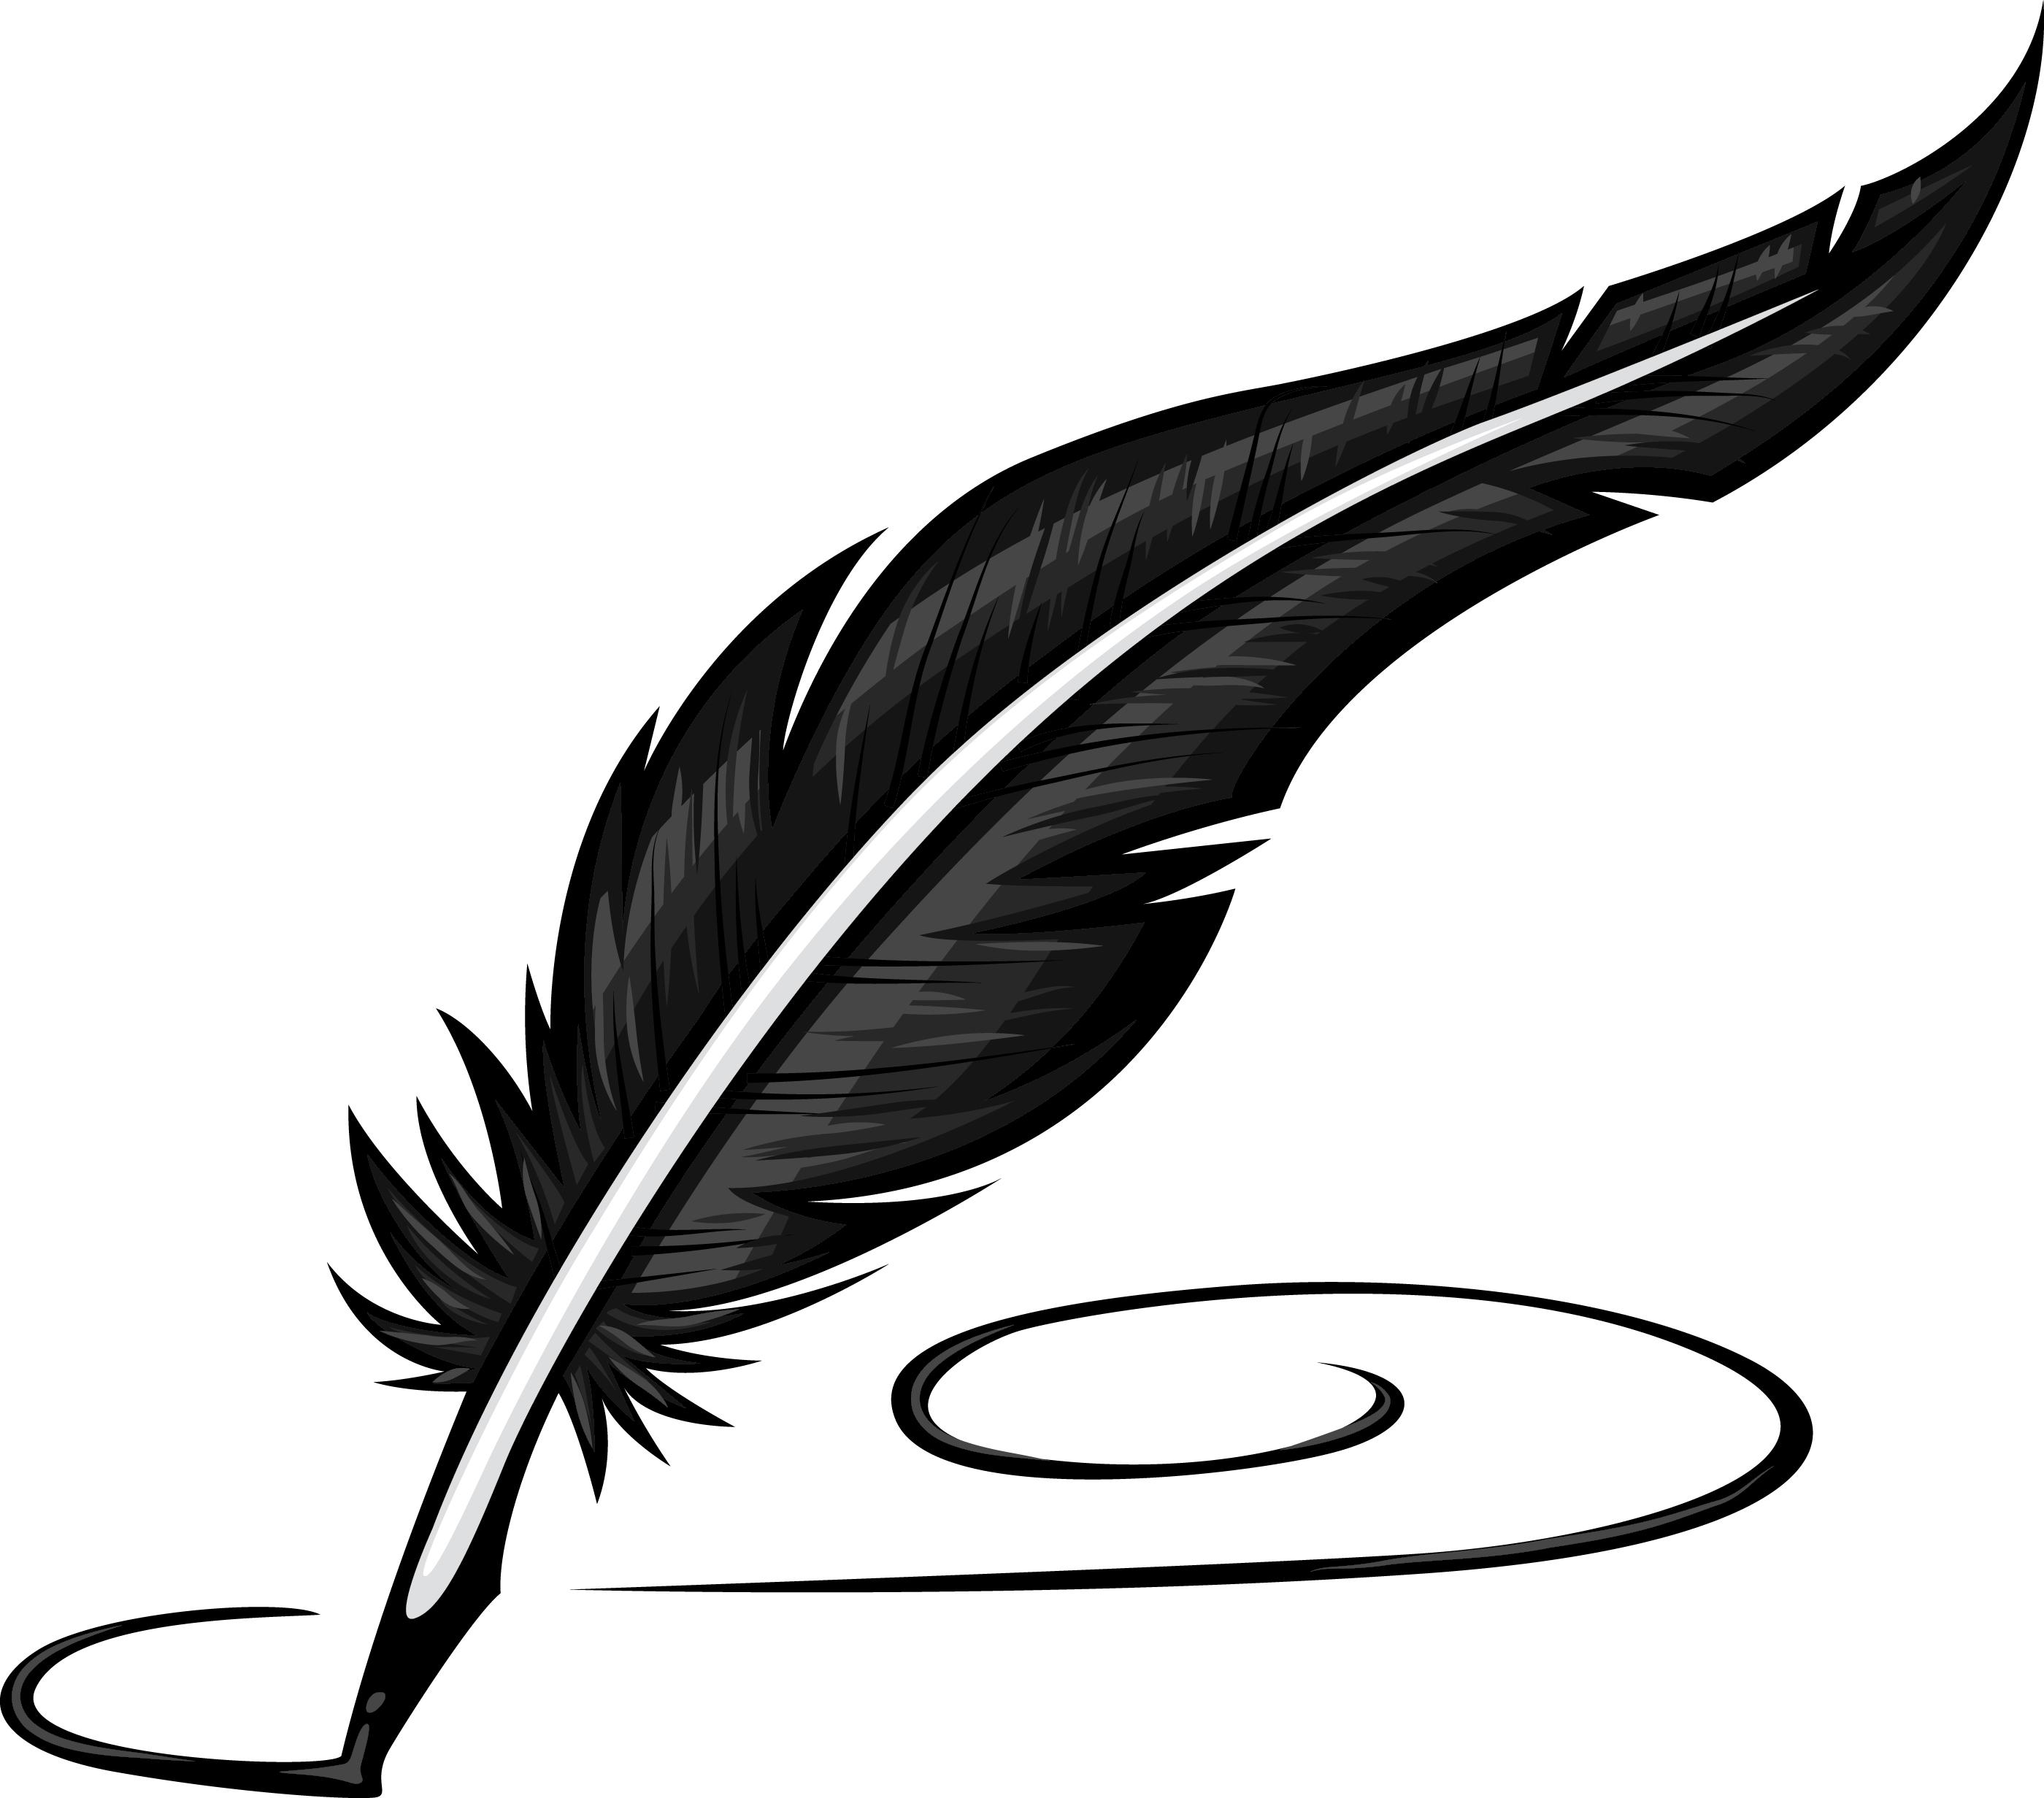 Feather Pen Clipart #1